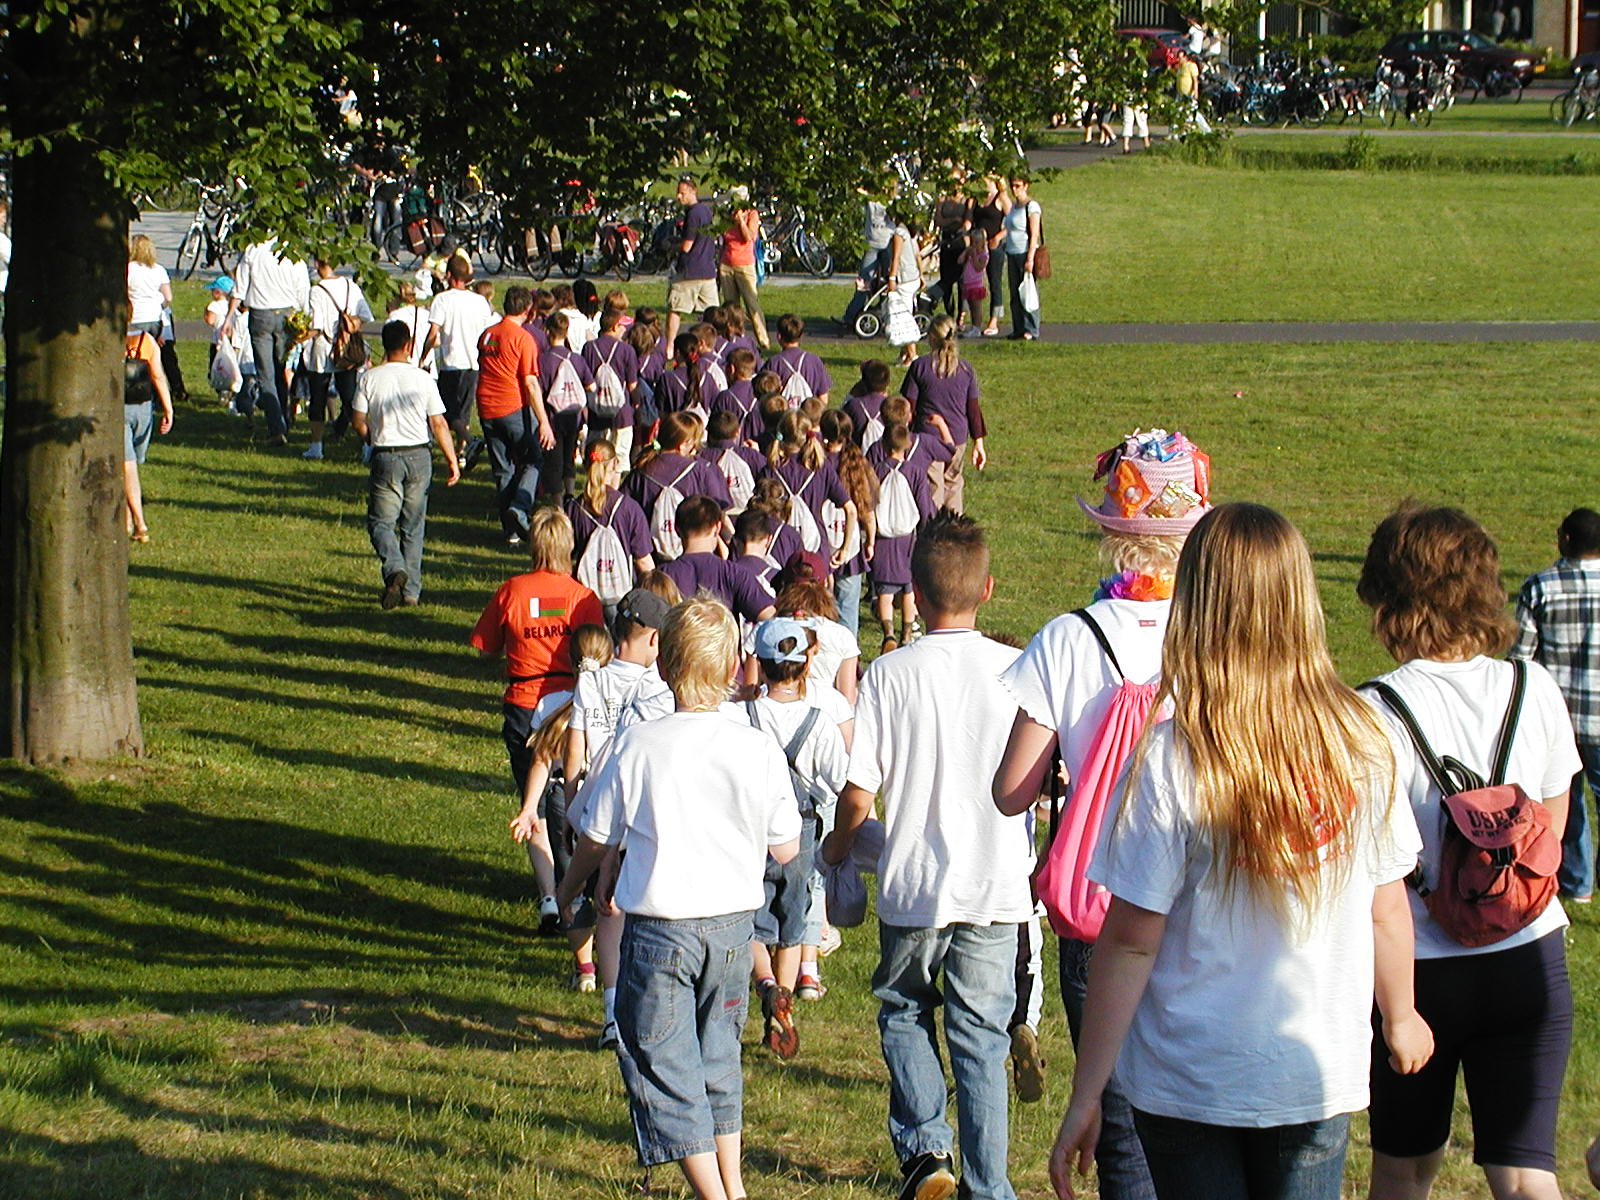 Wandelsportvereniging Shrewsbury stopt met organisatie avondvierdaagse